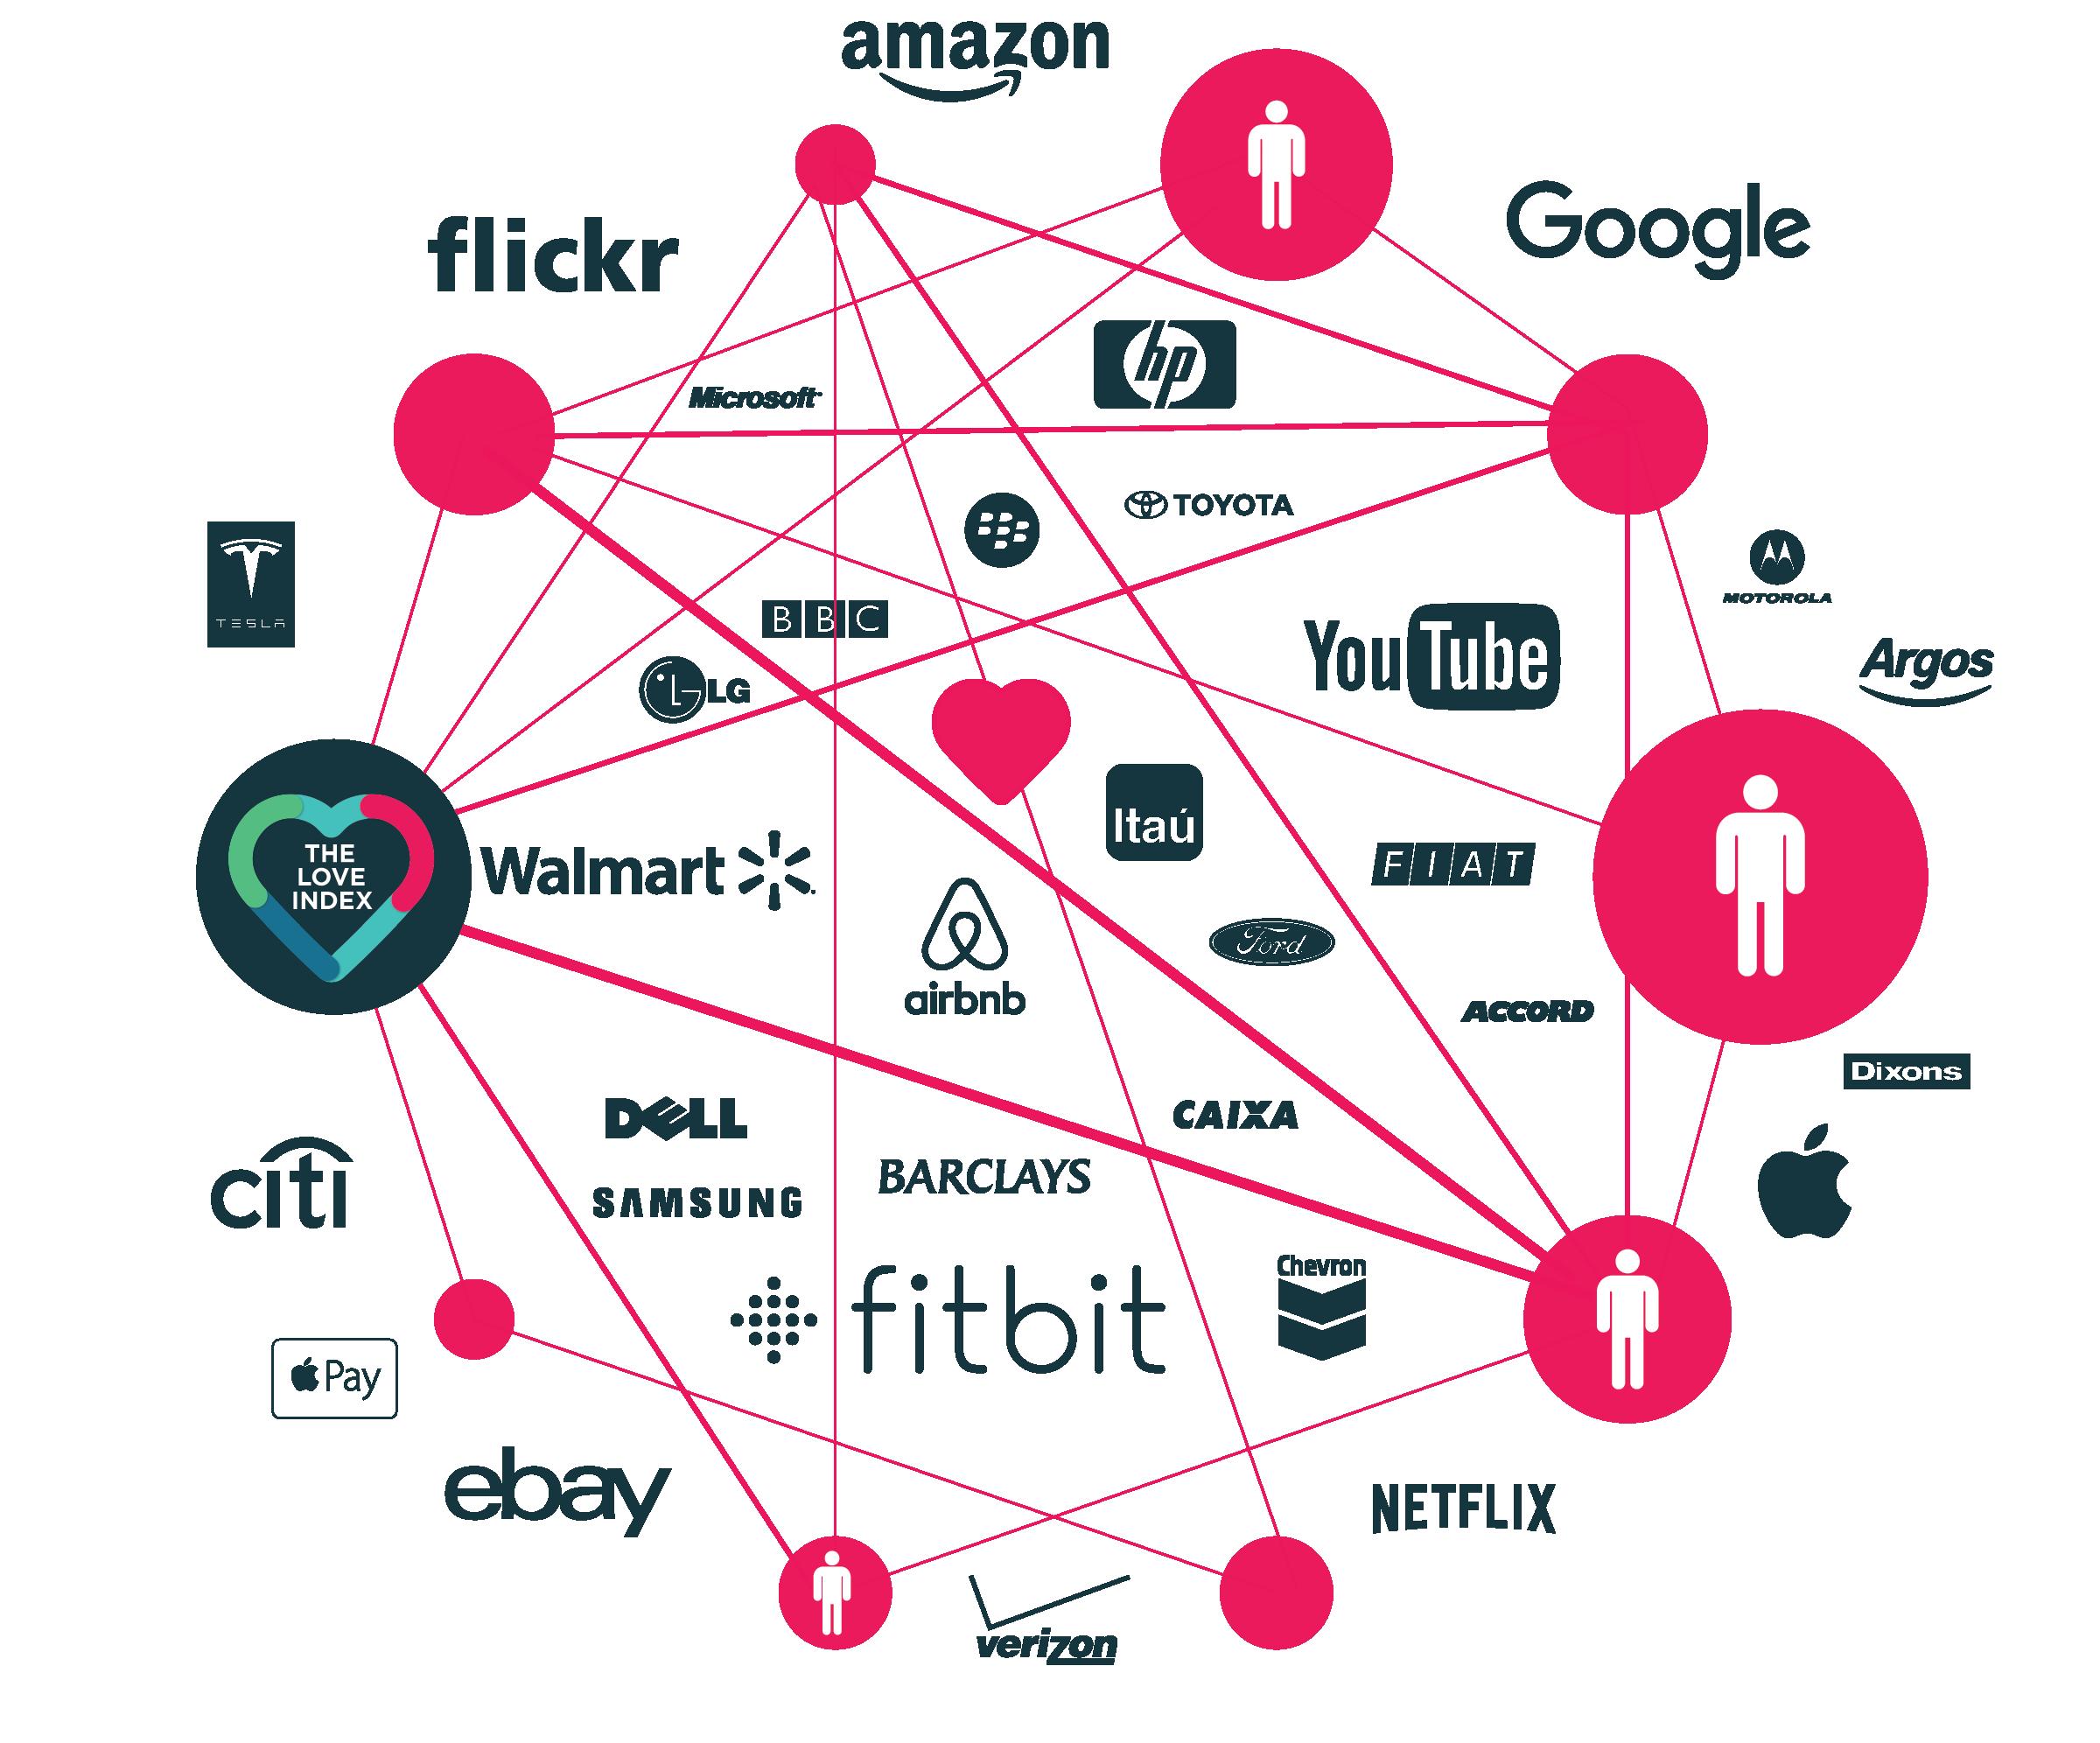 The love diagram electrical work wiring diagram love index 2016 accenture interactive rh accenture com heart venn diagram executive relationships venn diagram ccuart Choice Image